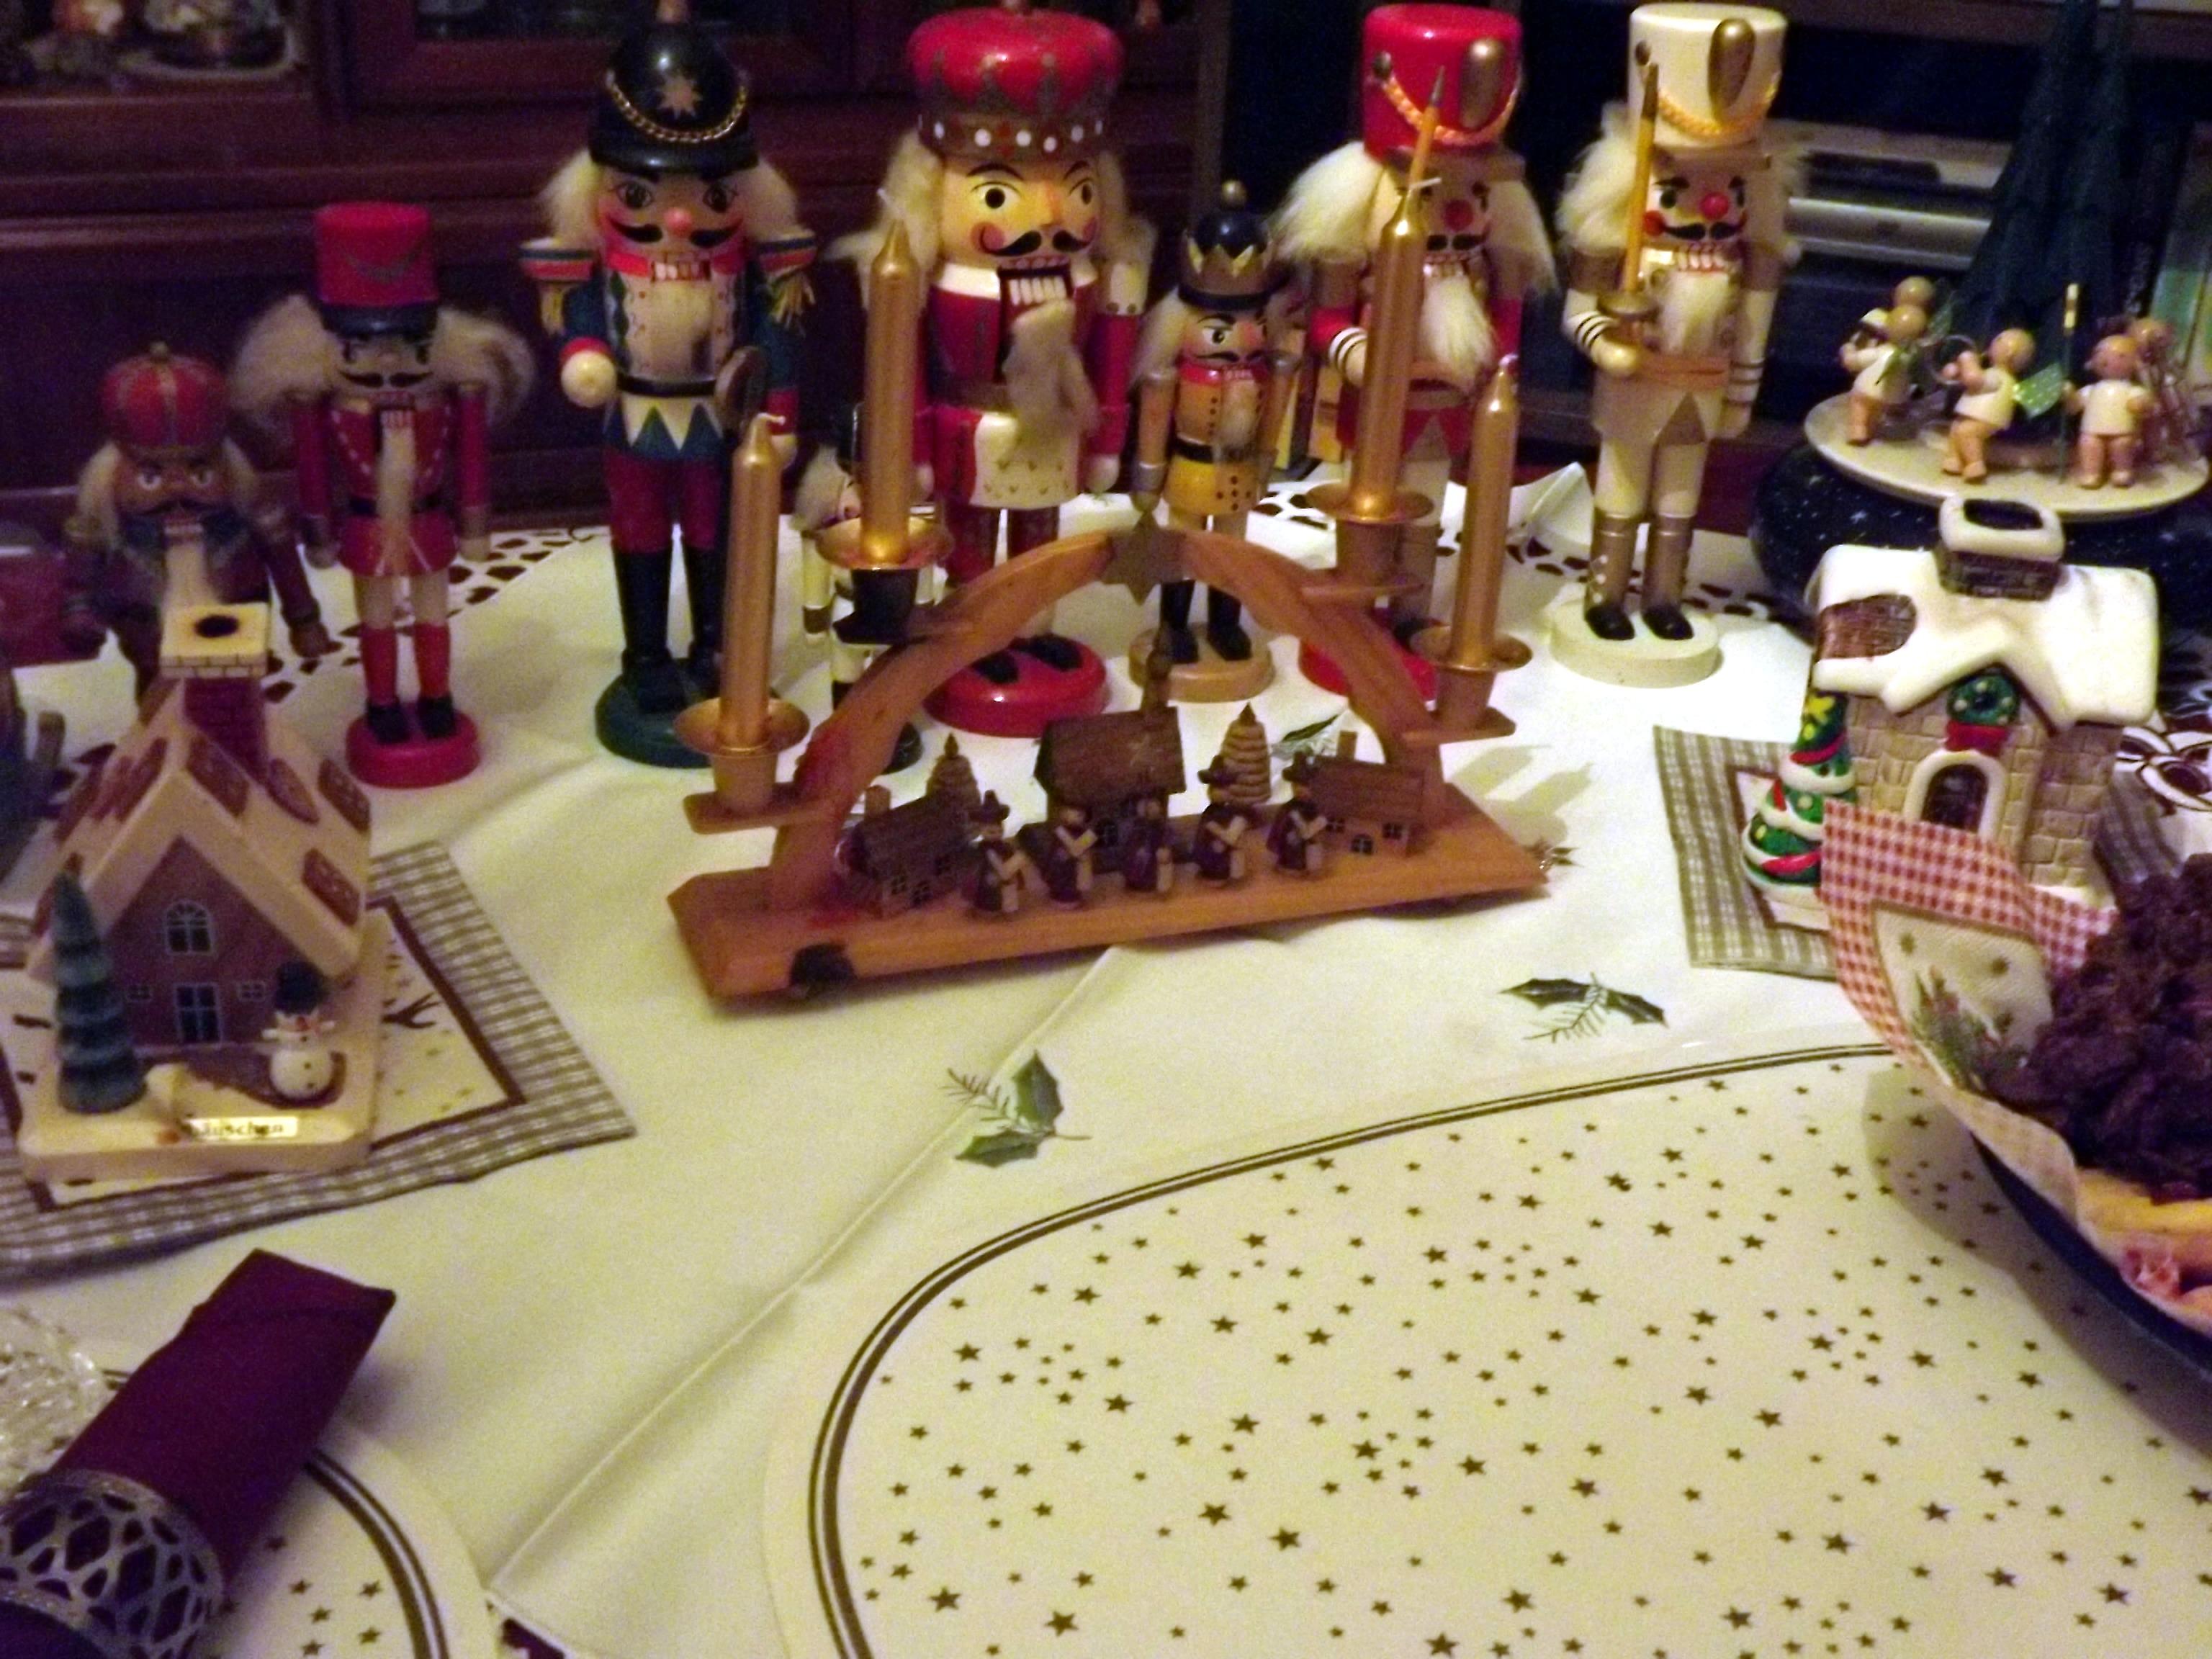 weihnachts dekoration krismaso photogallery. Black Bedroom Furniture Sets. Home Design Ideas